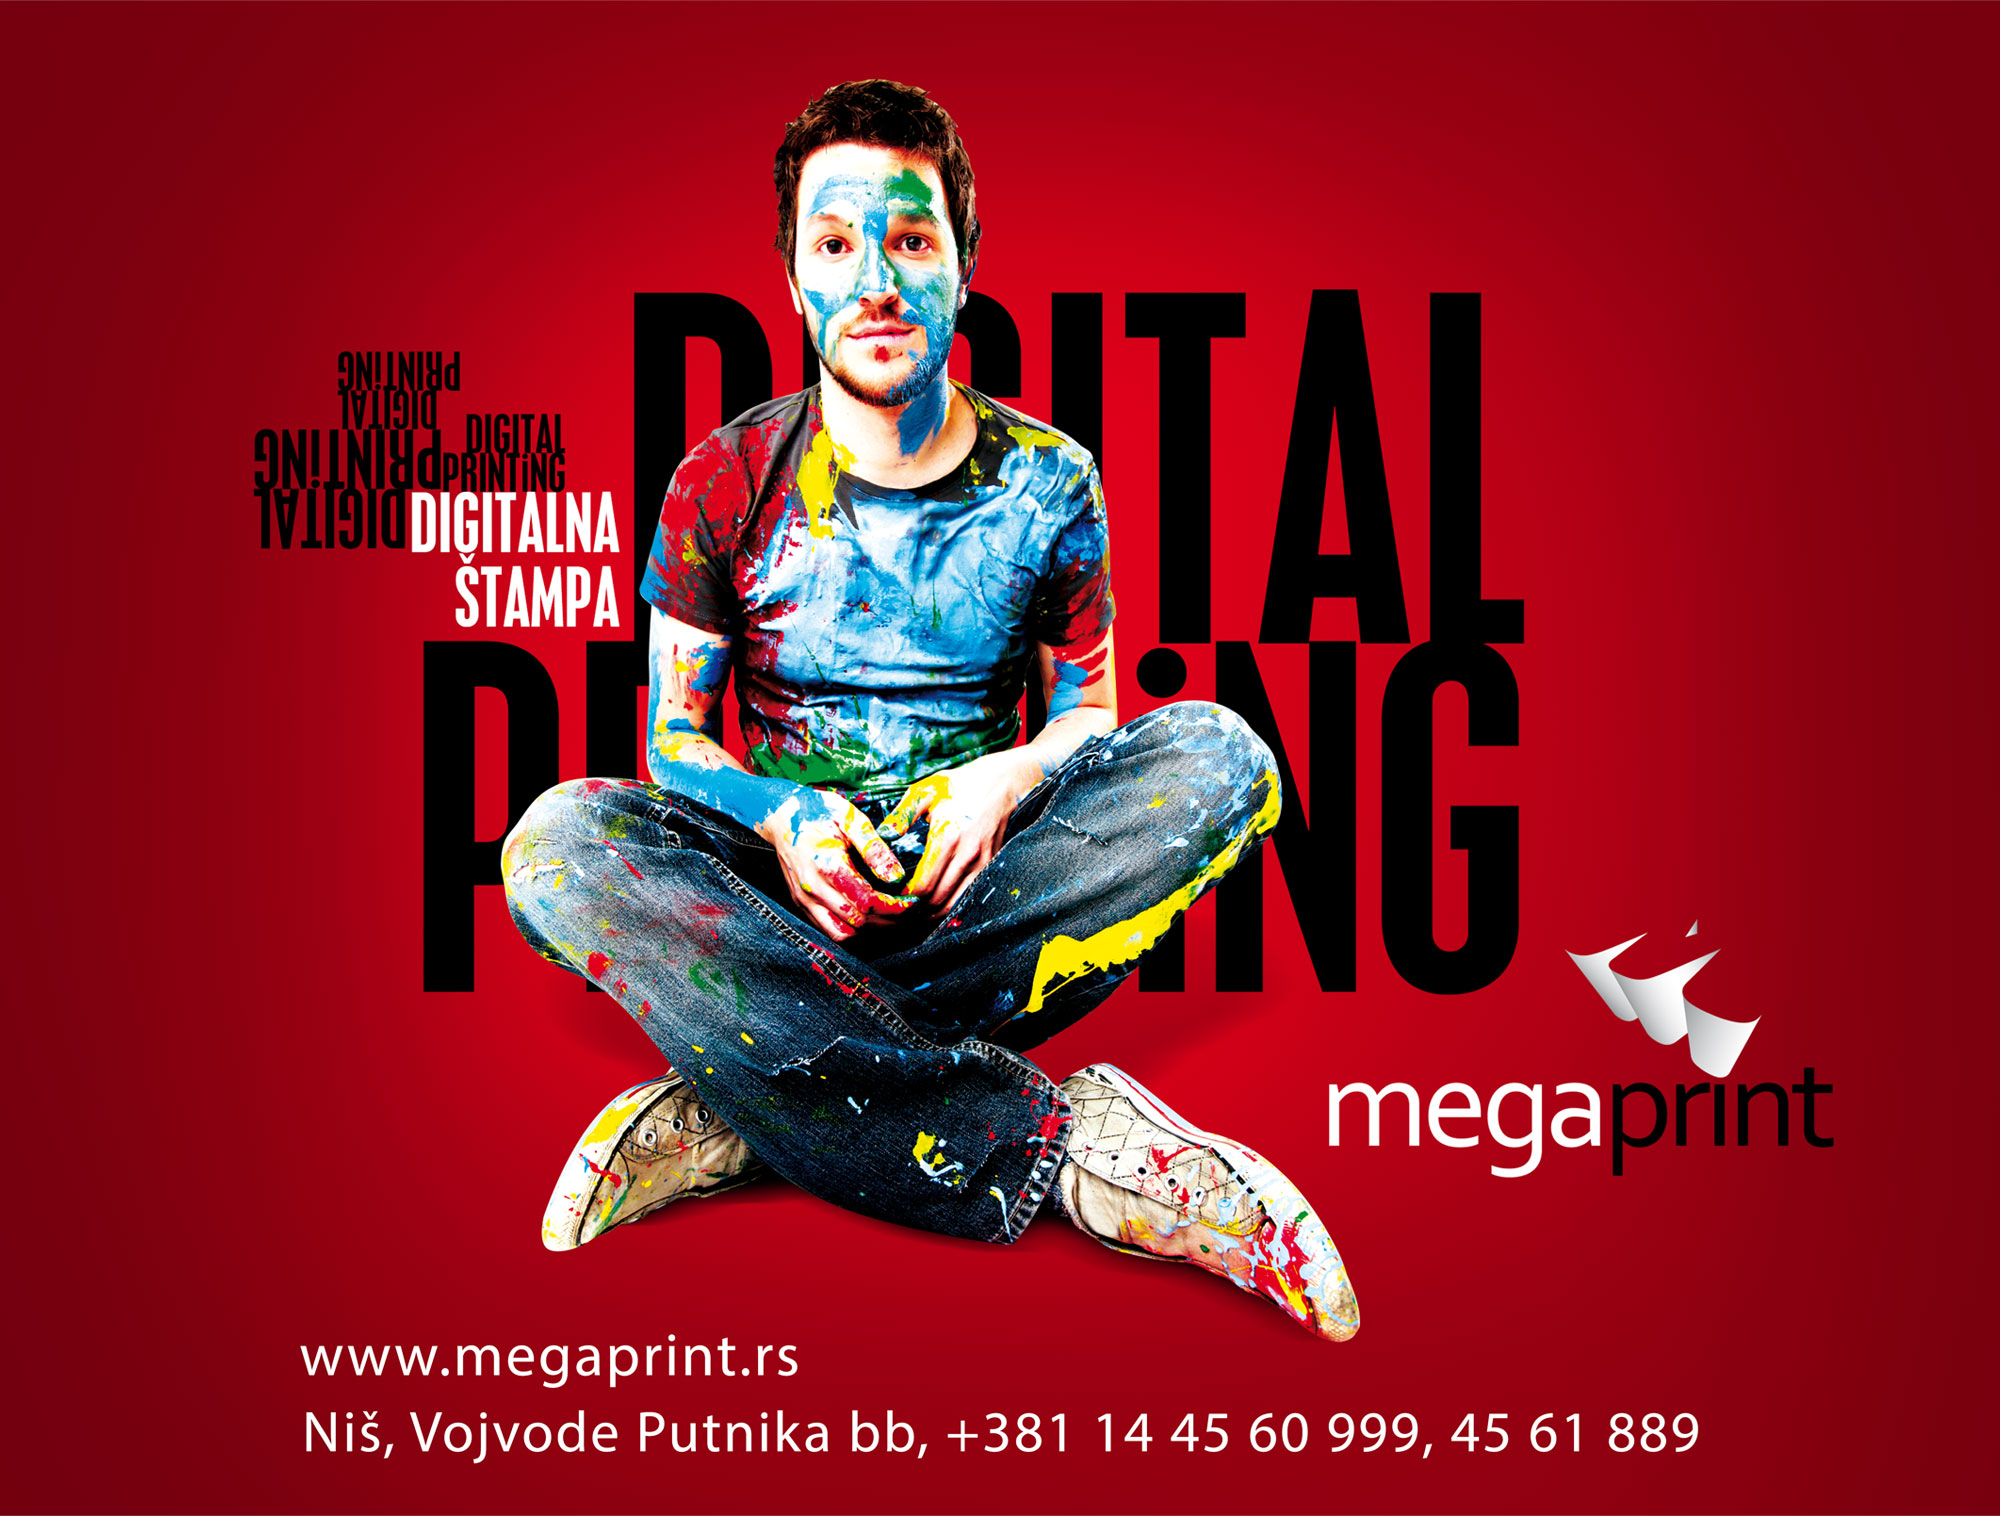 mega print poster 3